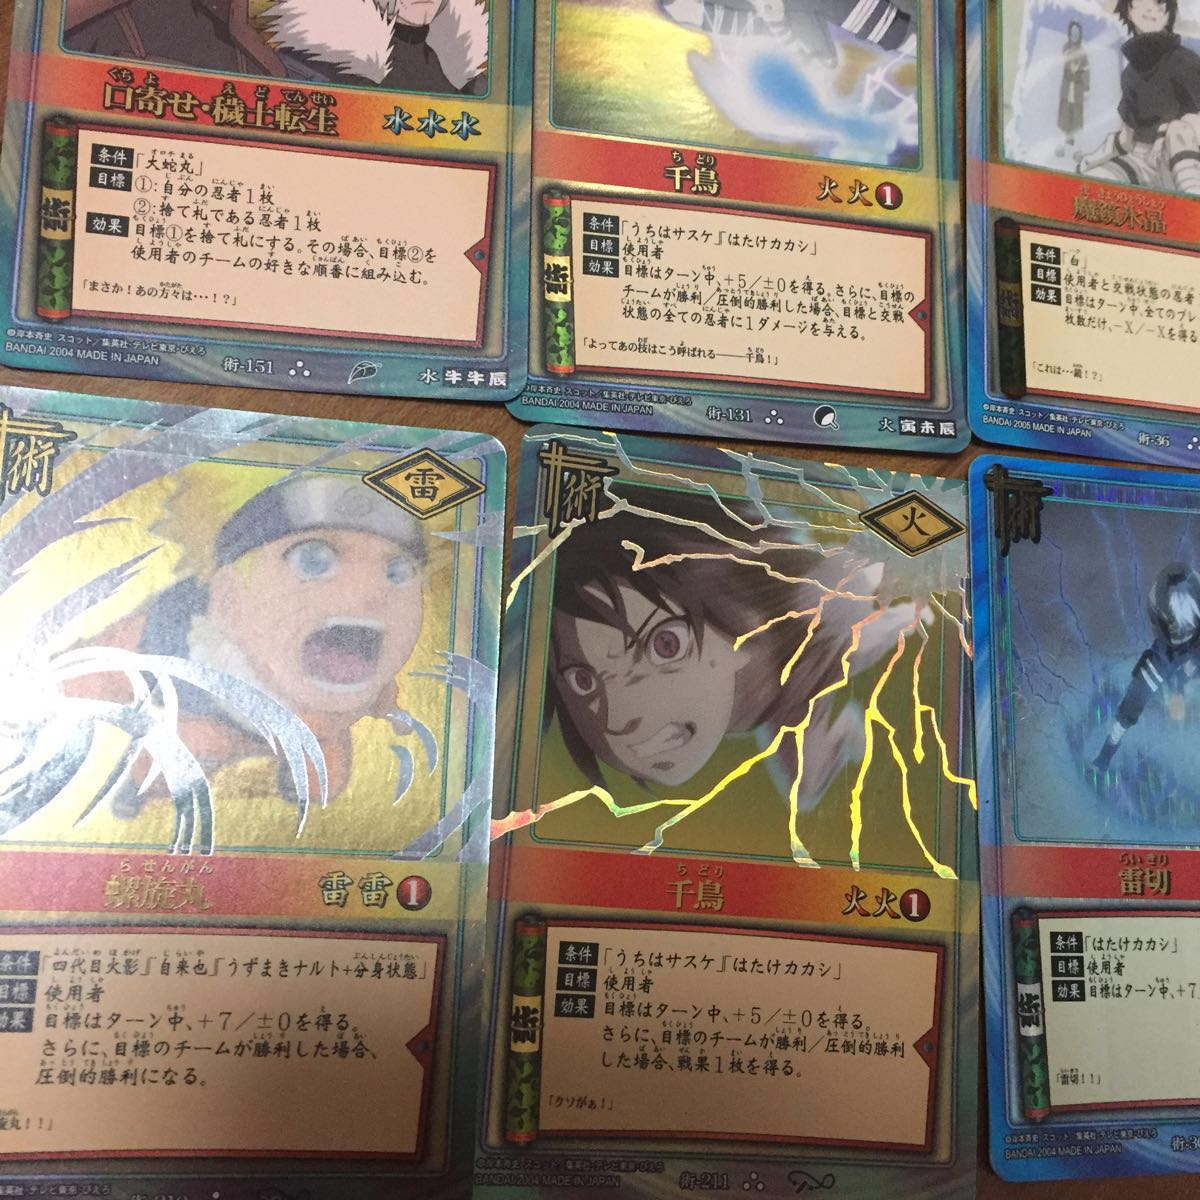 NARUTOナルトカードゲーム URまとめてセット術 螺旋丸 千鳥 雷切 カカシ サスケ 火影_画像2